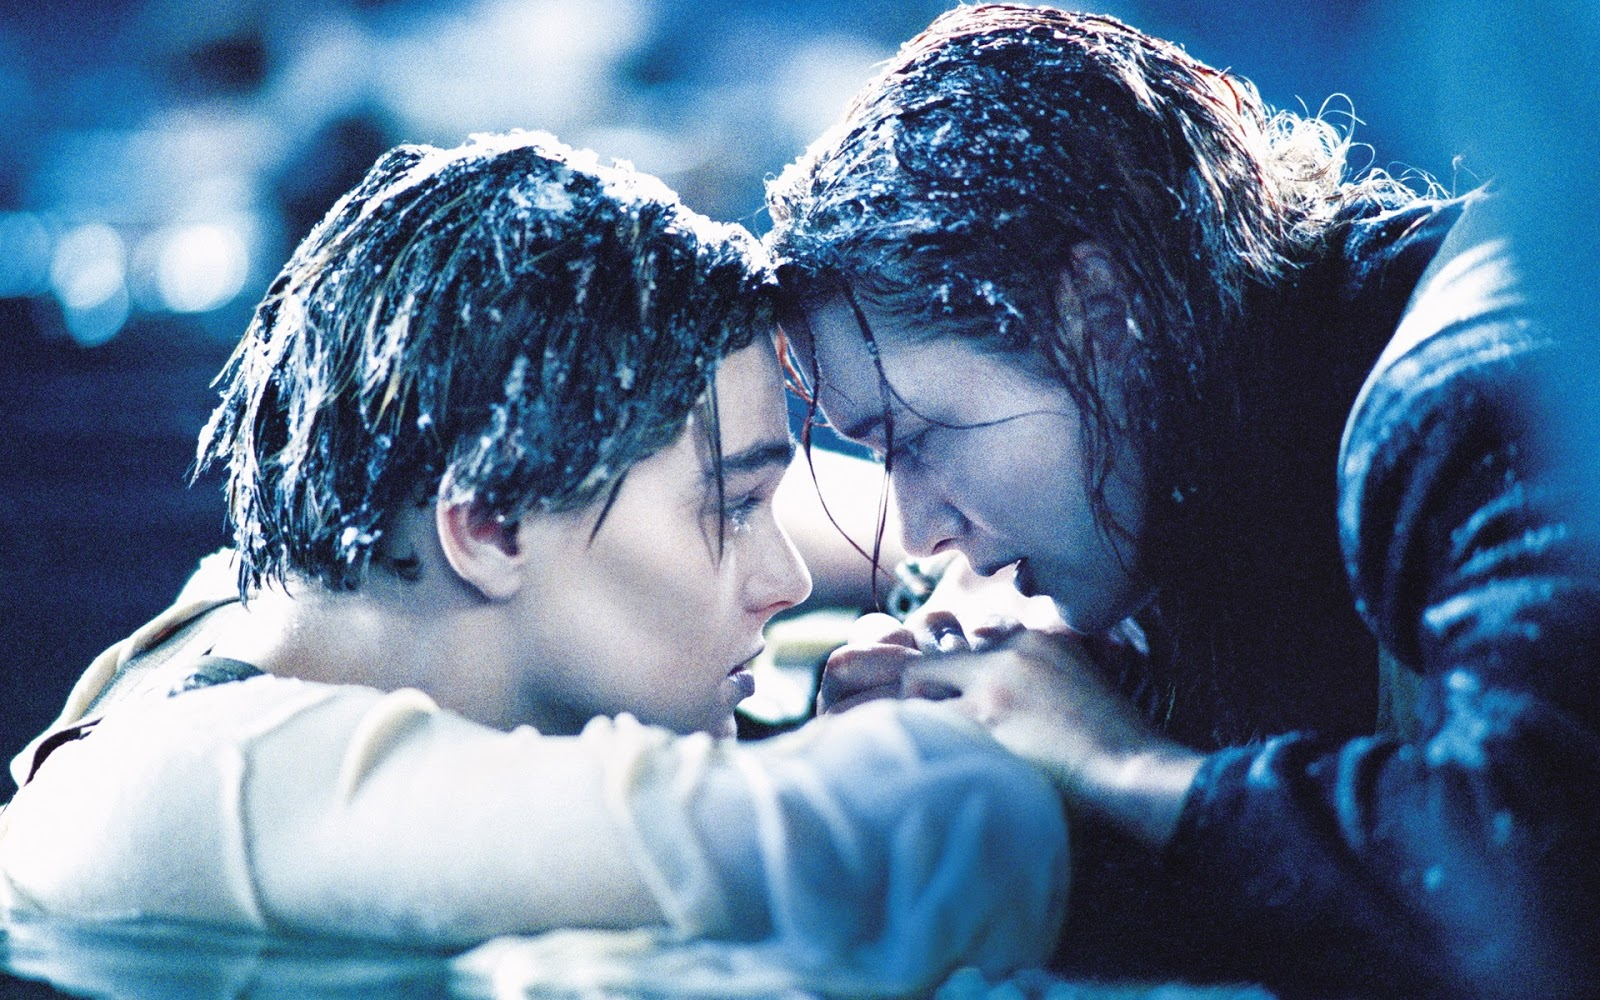 http://1.bp.blogspot.com/-sE-tSxO8iPI/UQmt0qnBwYI/AAAAAAAAvaI/9cfEFv9xm0M/s1600/Leonardo-DiCaprio-titanic-scene.jpg